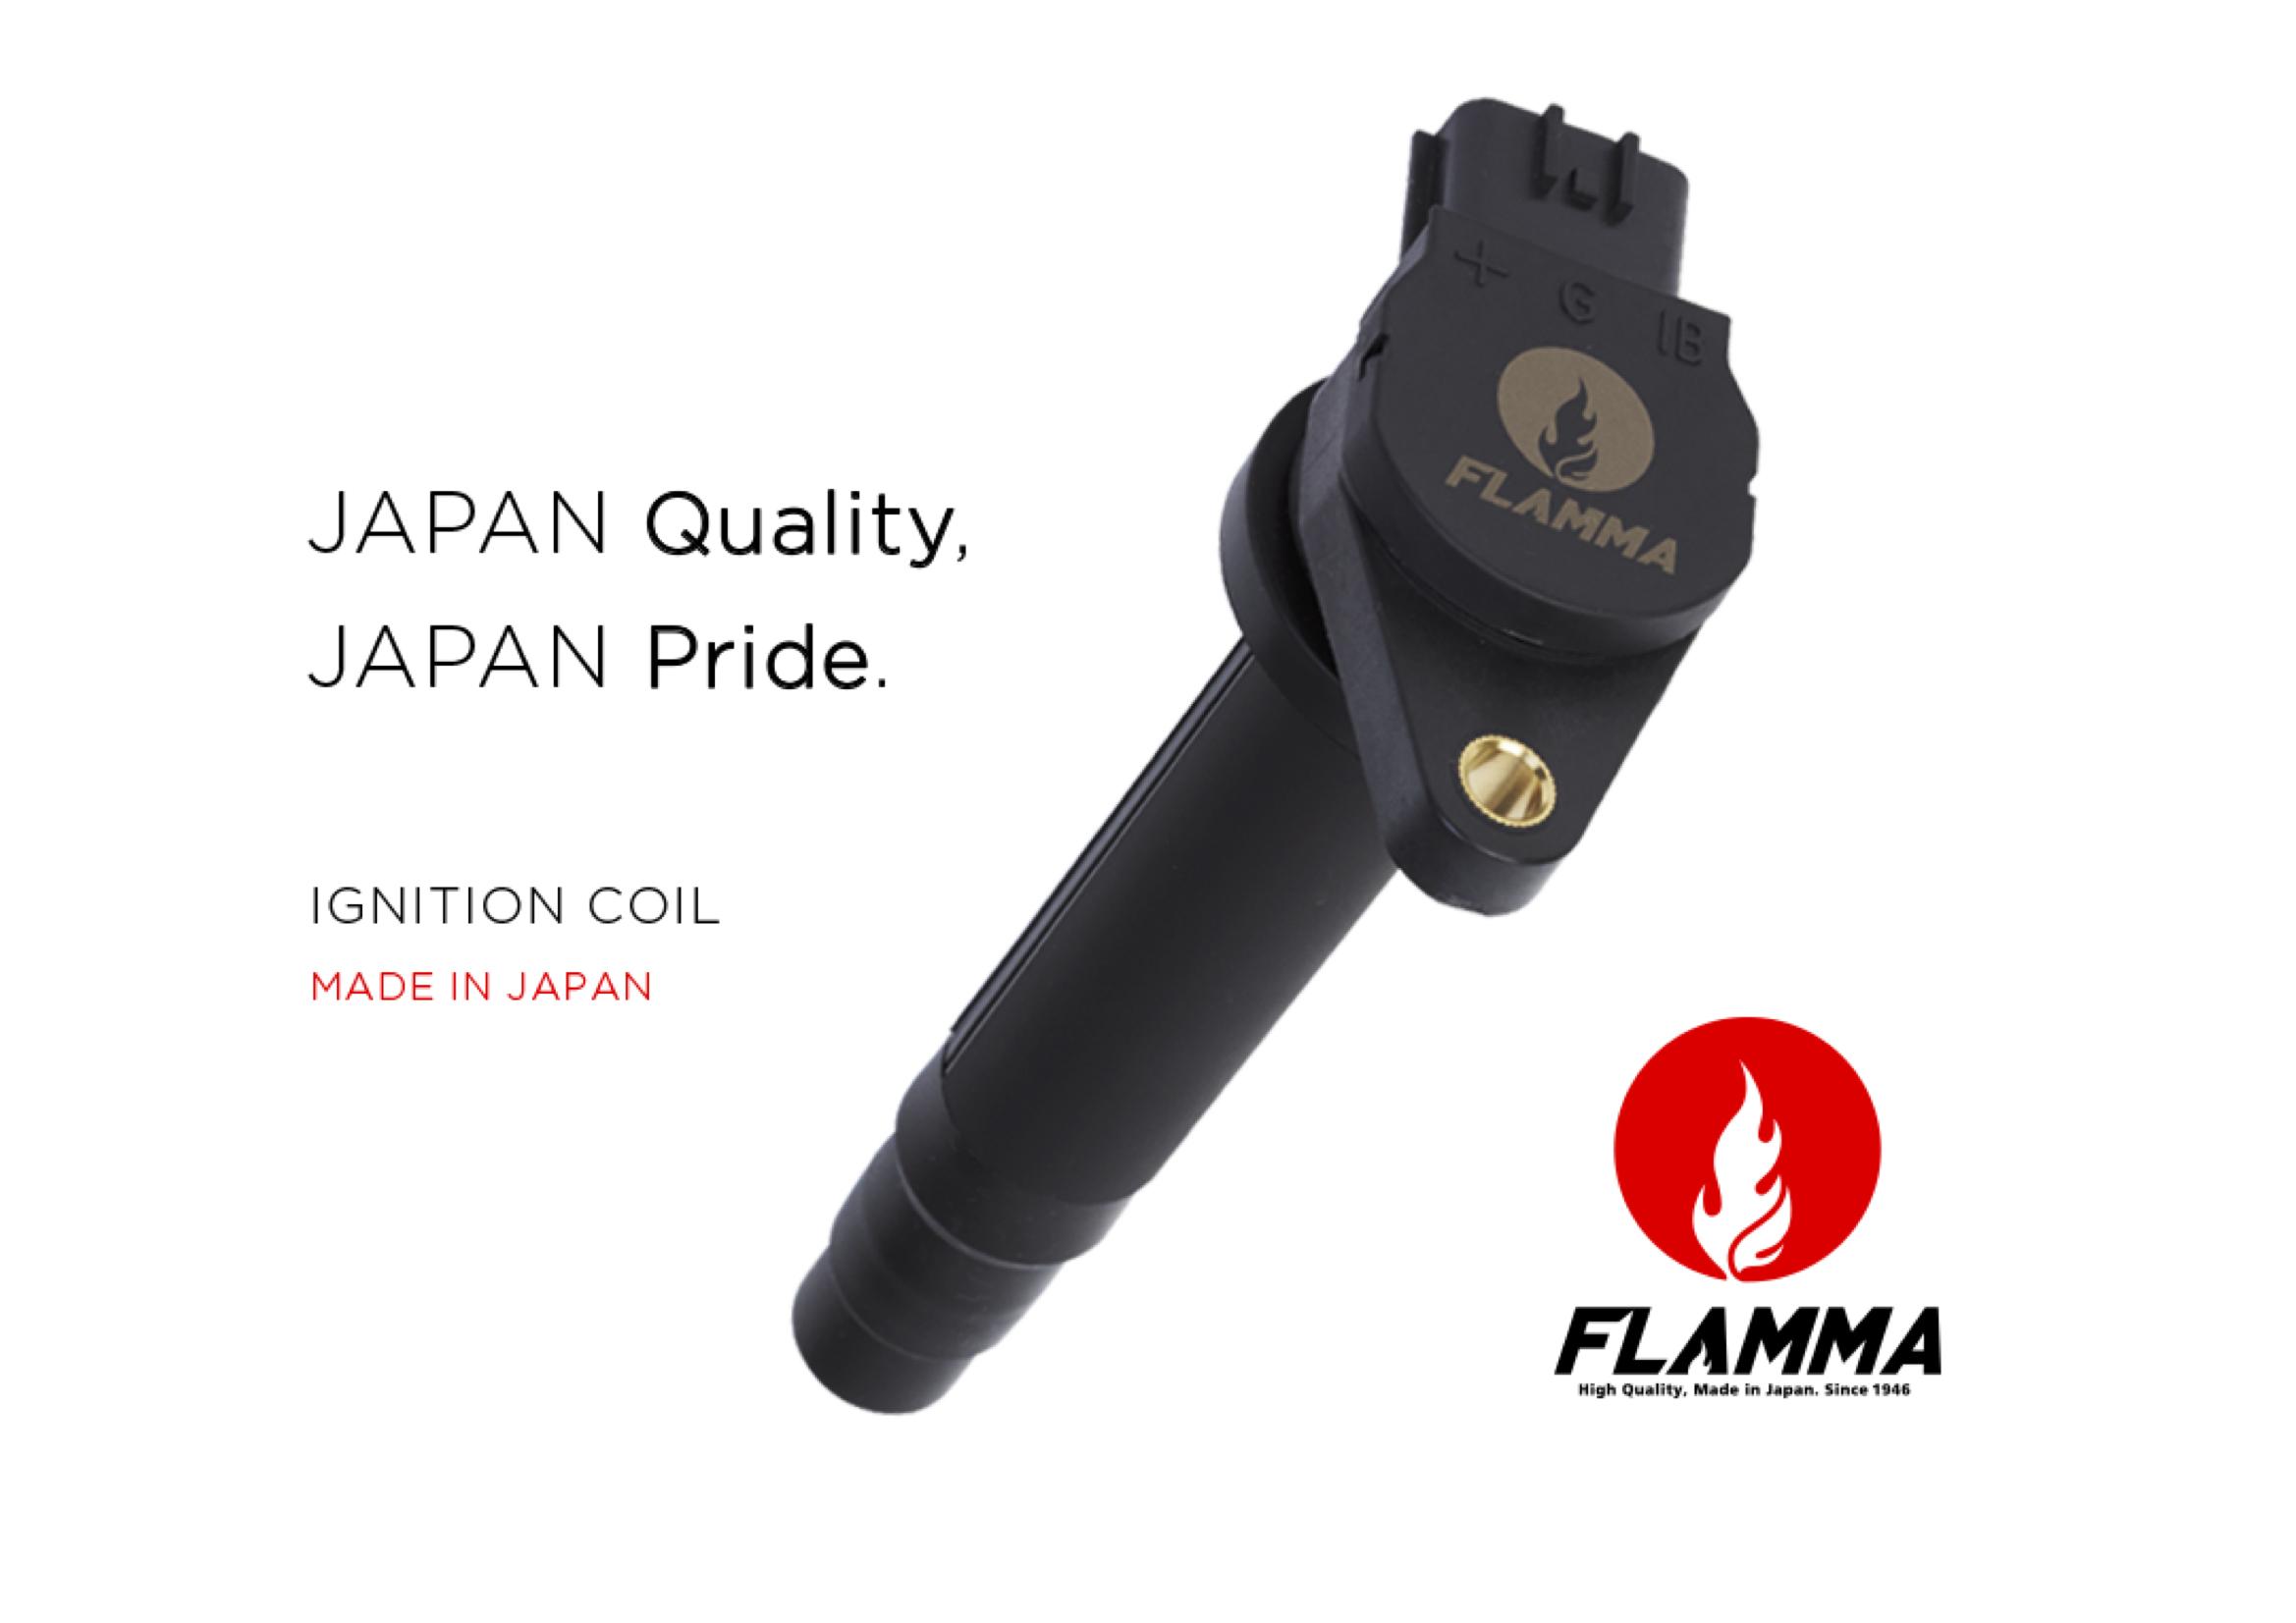 FLAMMA IGNITION COIL